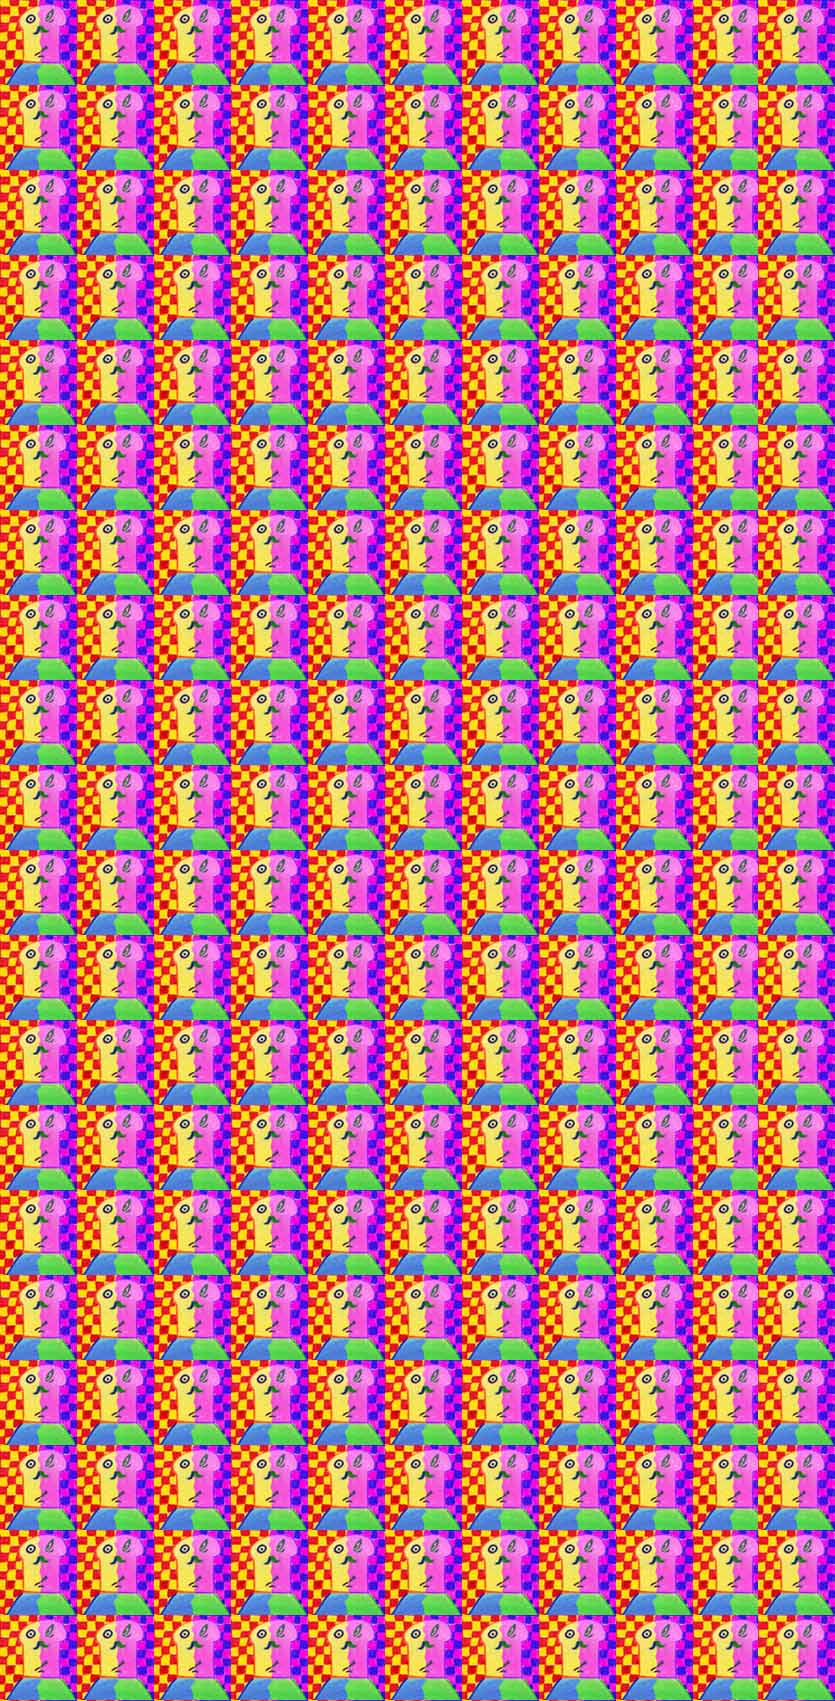 a0136846_1919996.jpg